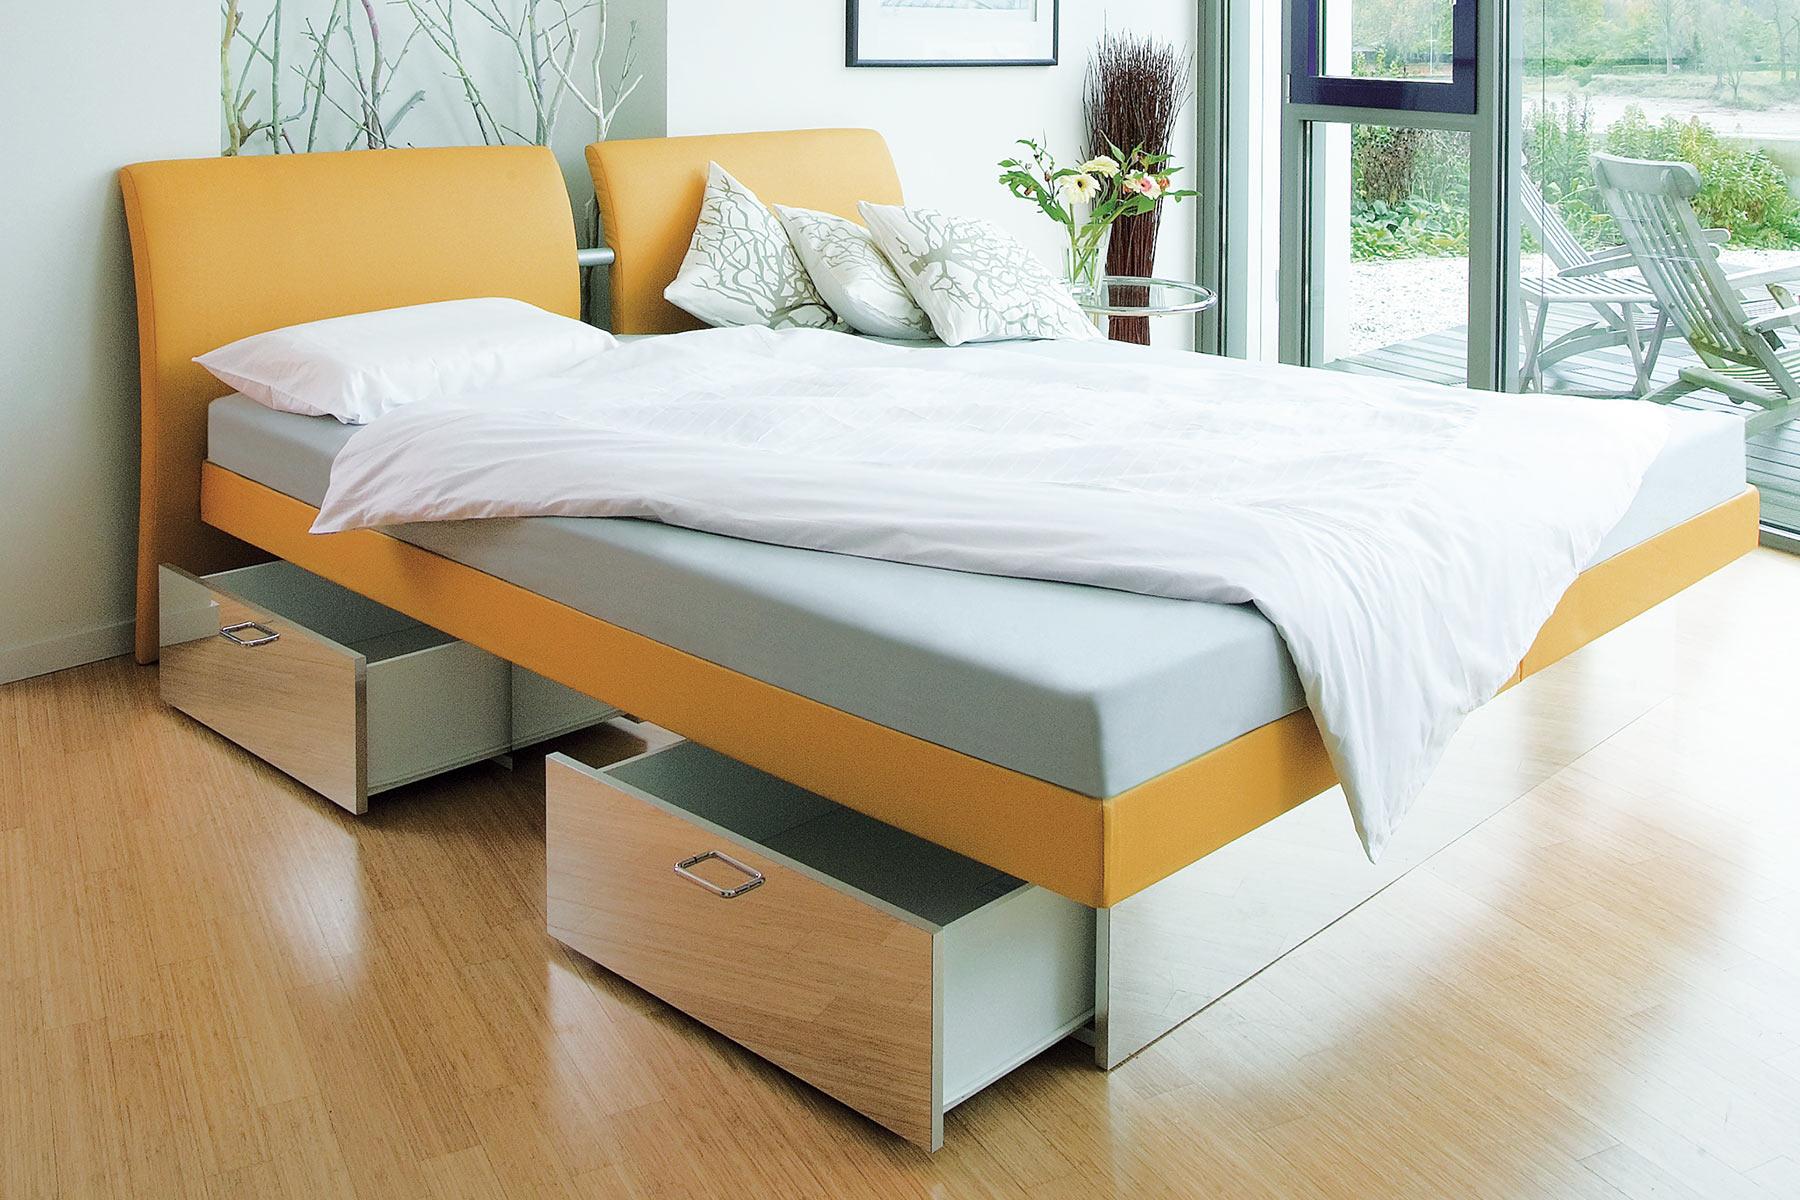 schubladen klappsockel blutimes wasserbetten. Black Bedroom Furniture Sets. Home Design Ideas